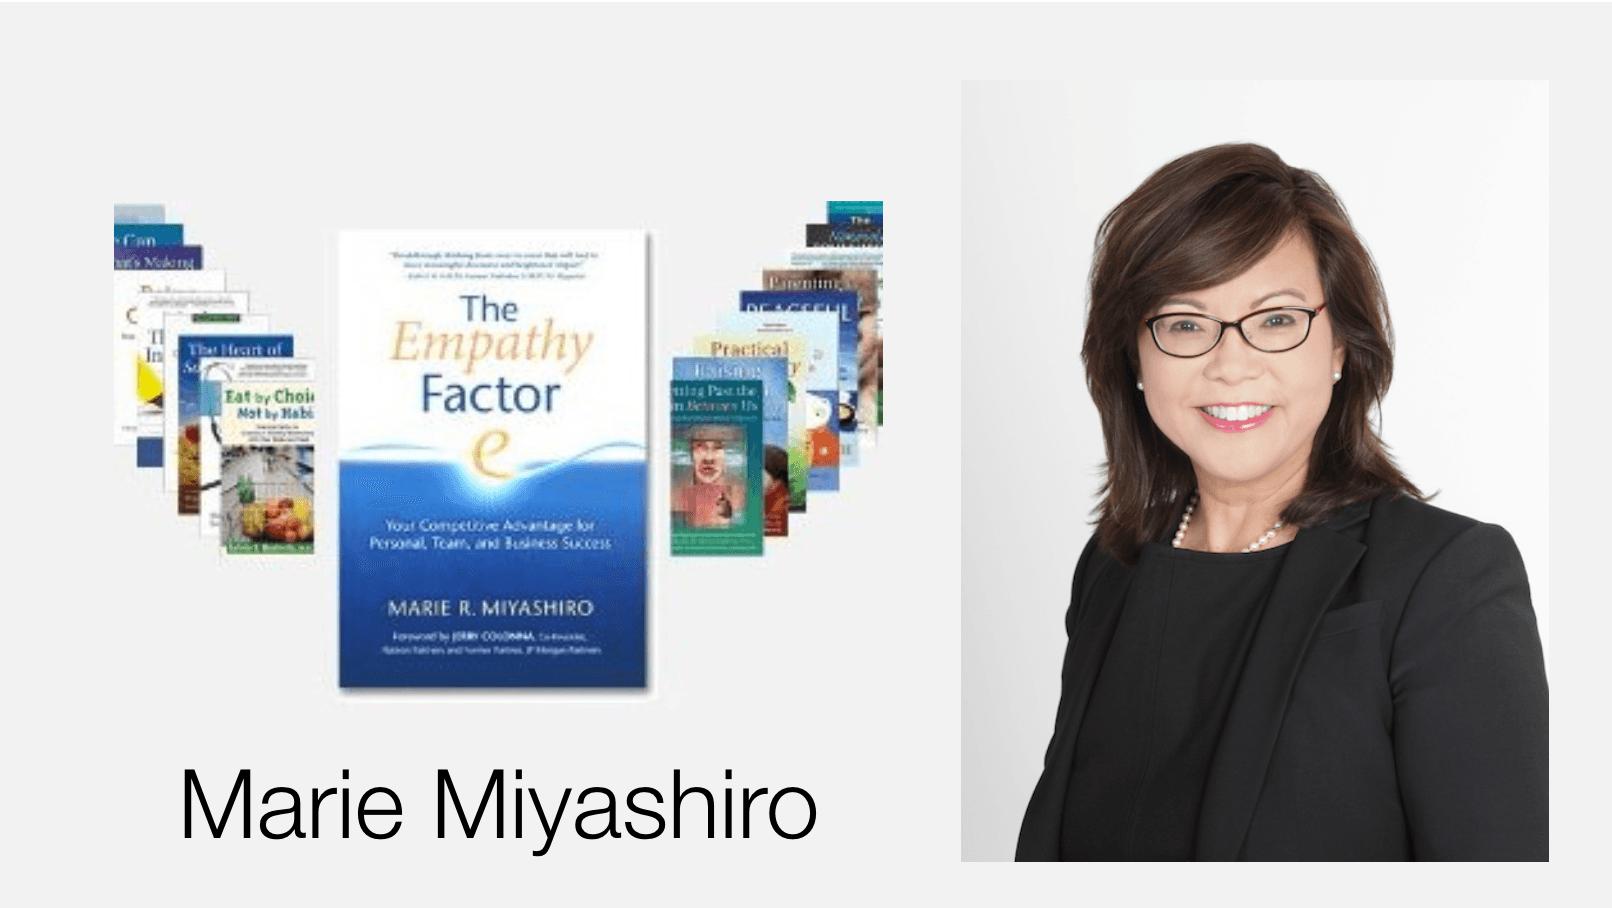 Marie Miyashiro Empathy Factor